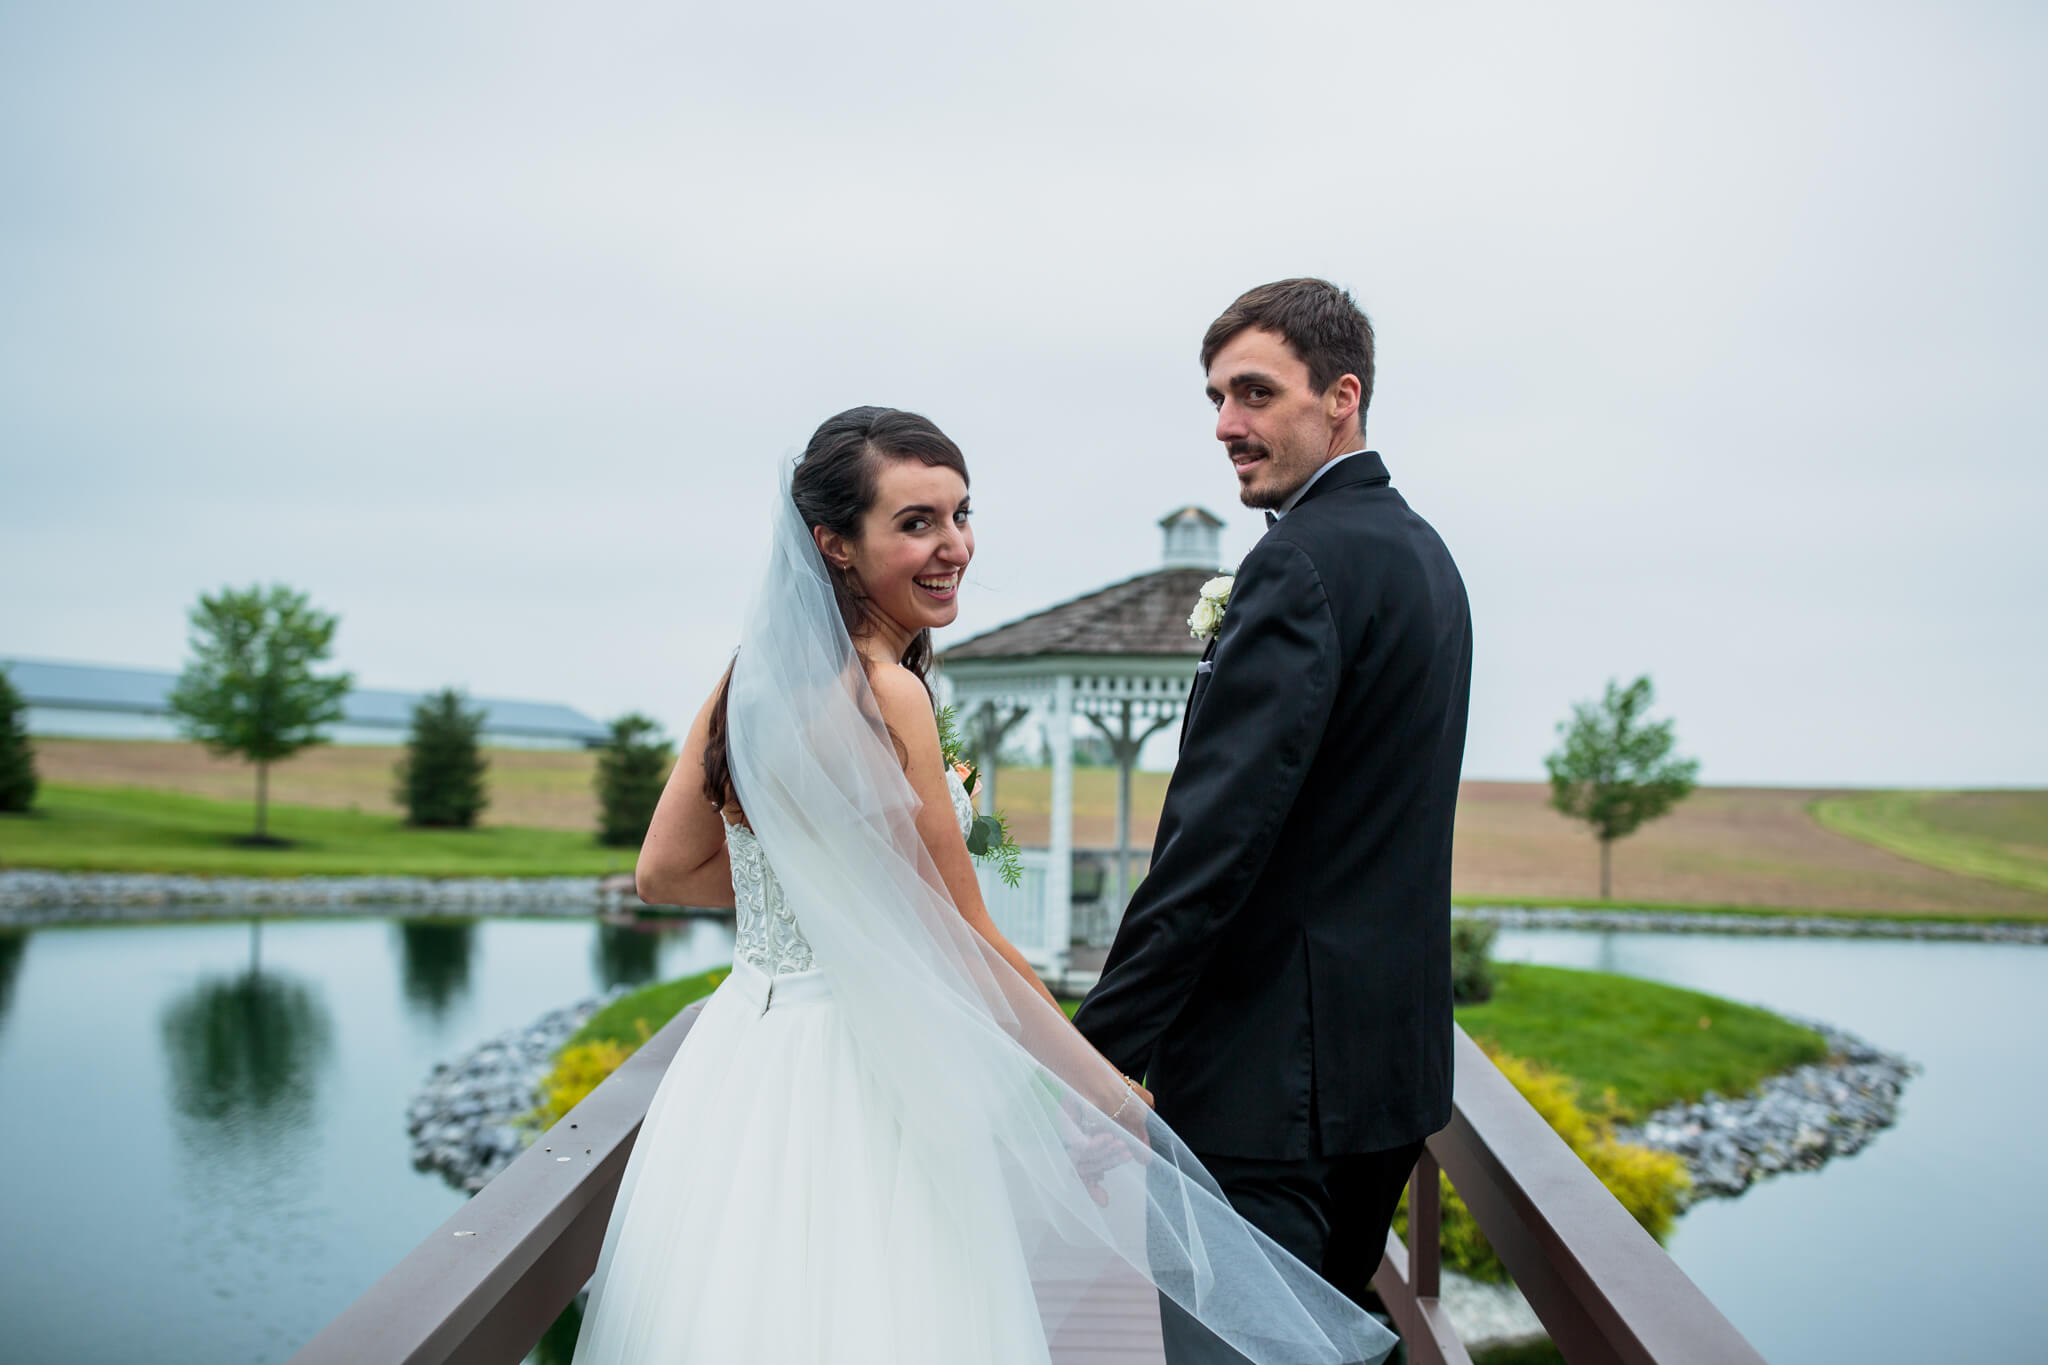 Alysia Jerad Homestead Blessings Farm Hershey PA Wedding Rustic Chique - 109.JPG